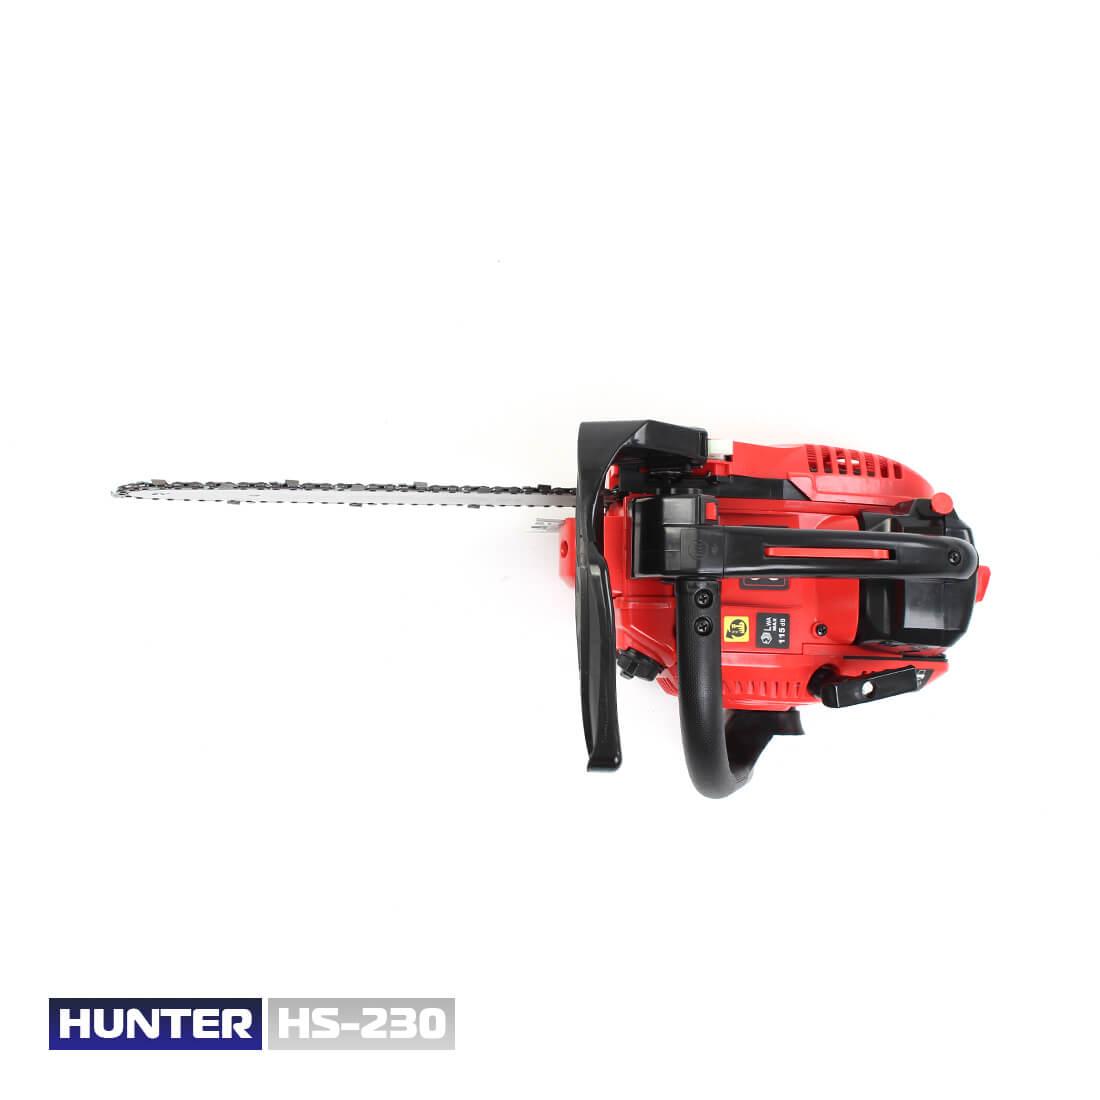 Фото Hunter HS-230 цена 3470грн №7 — Hunter